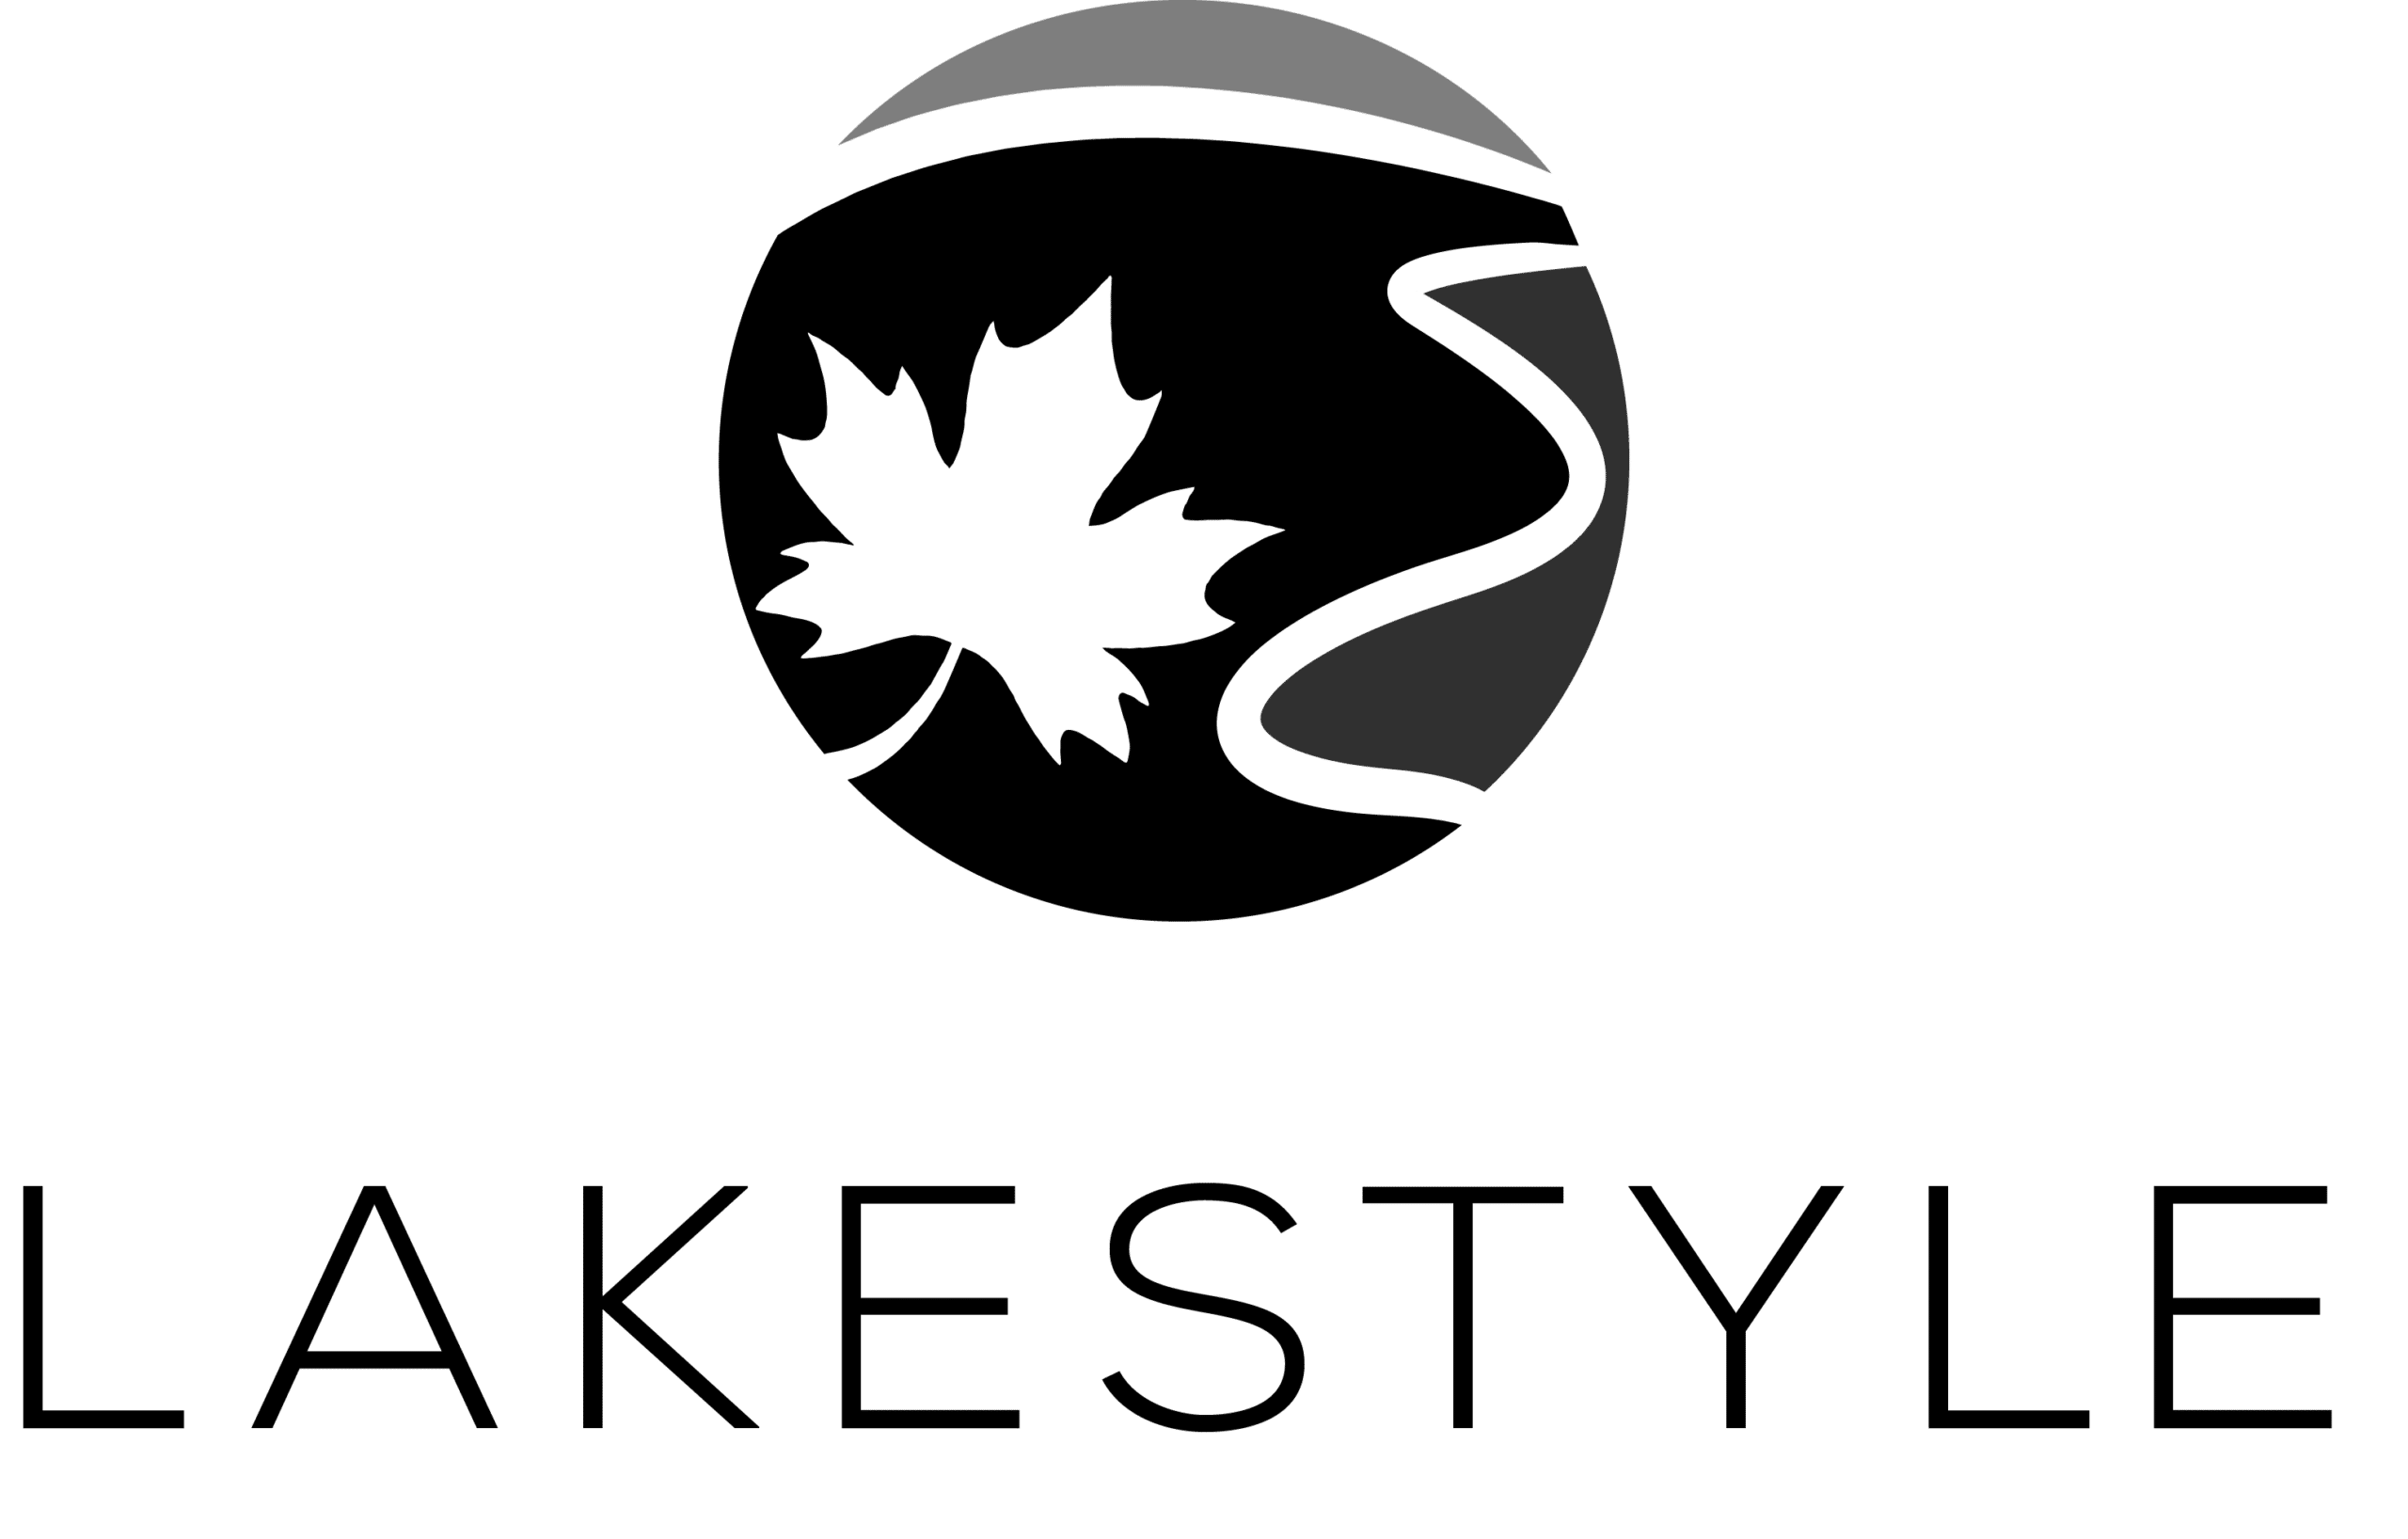 Lakestyle